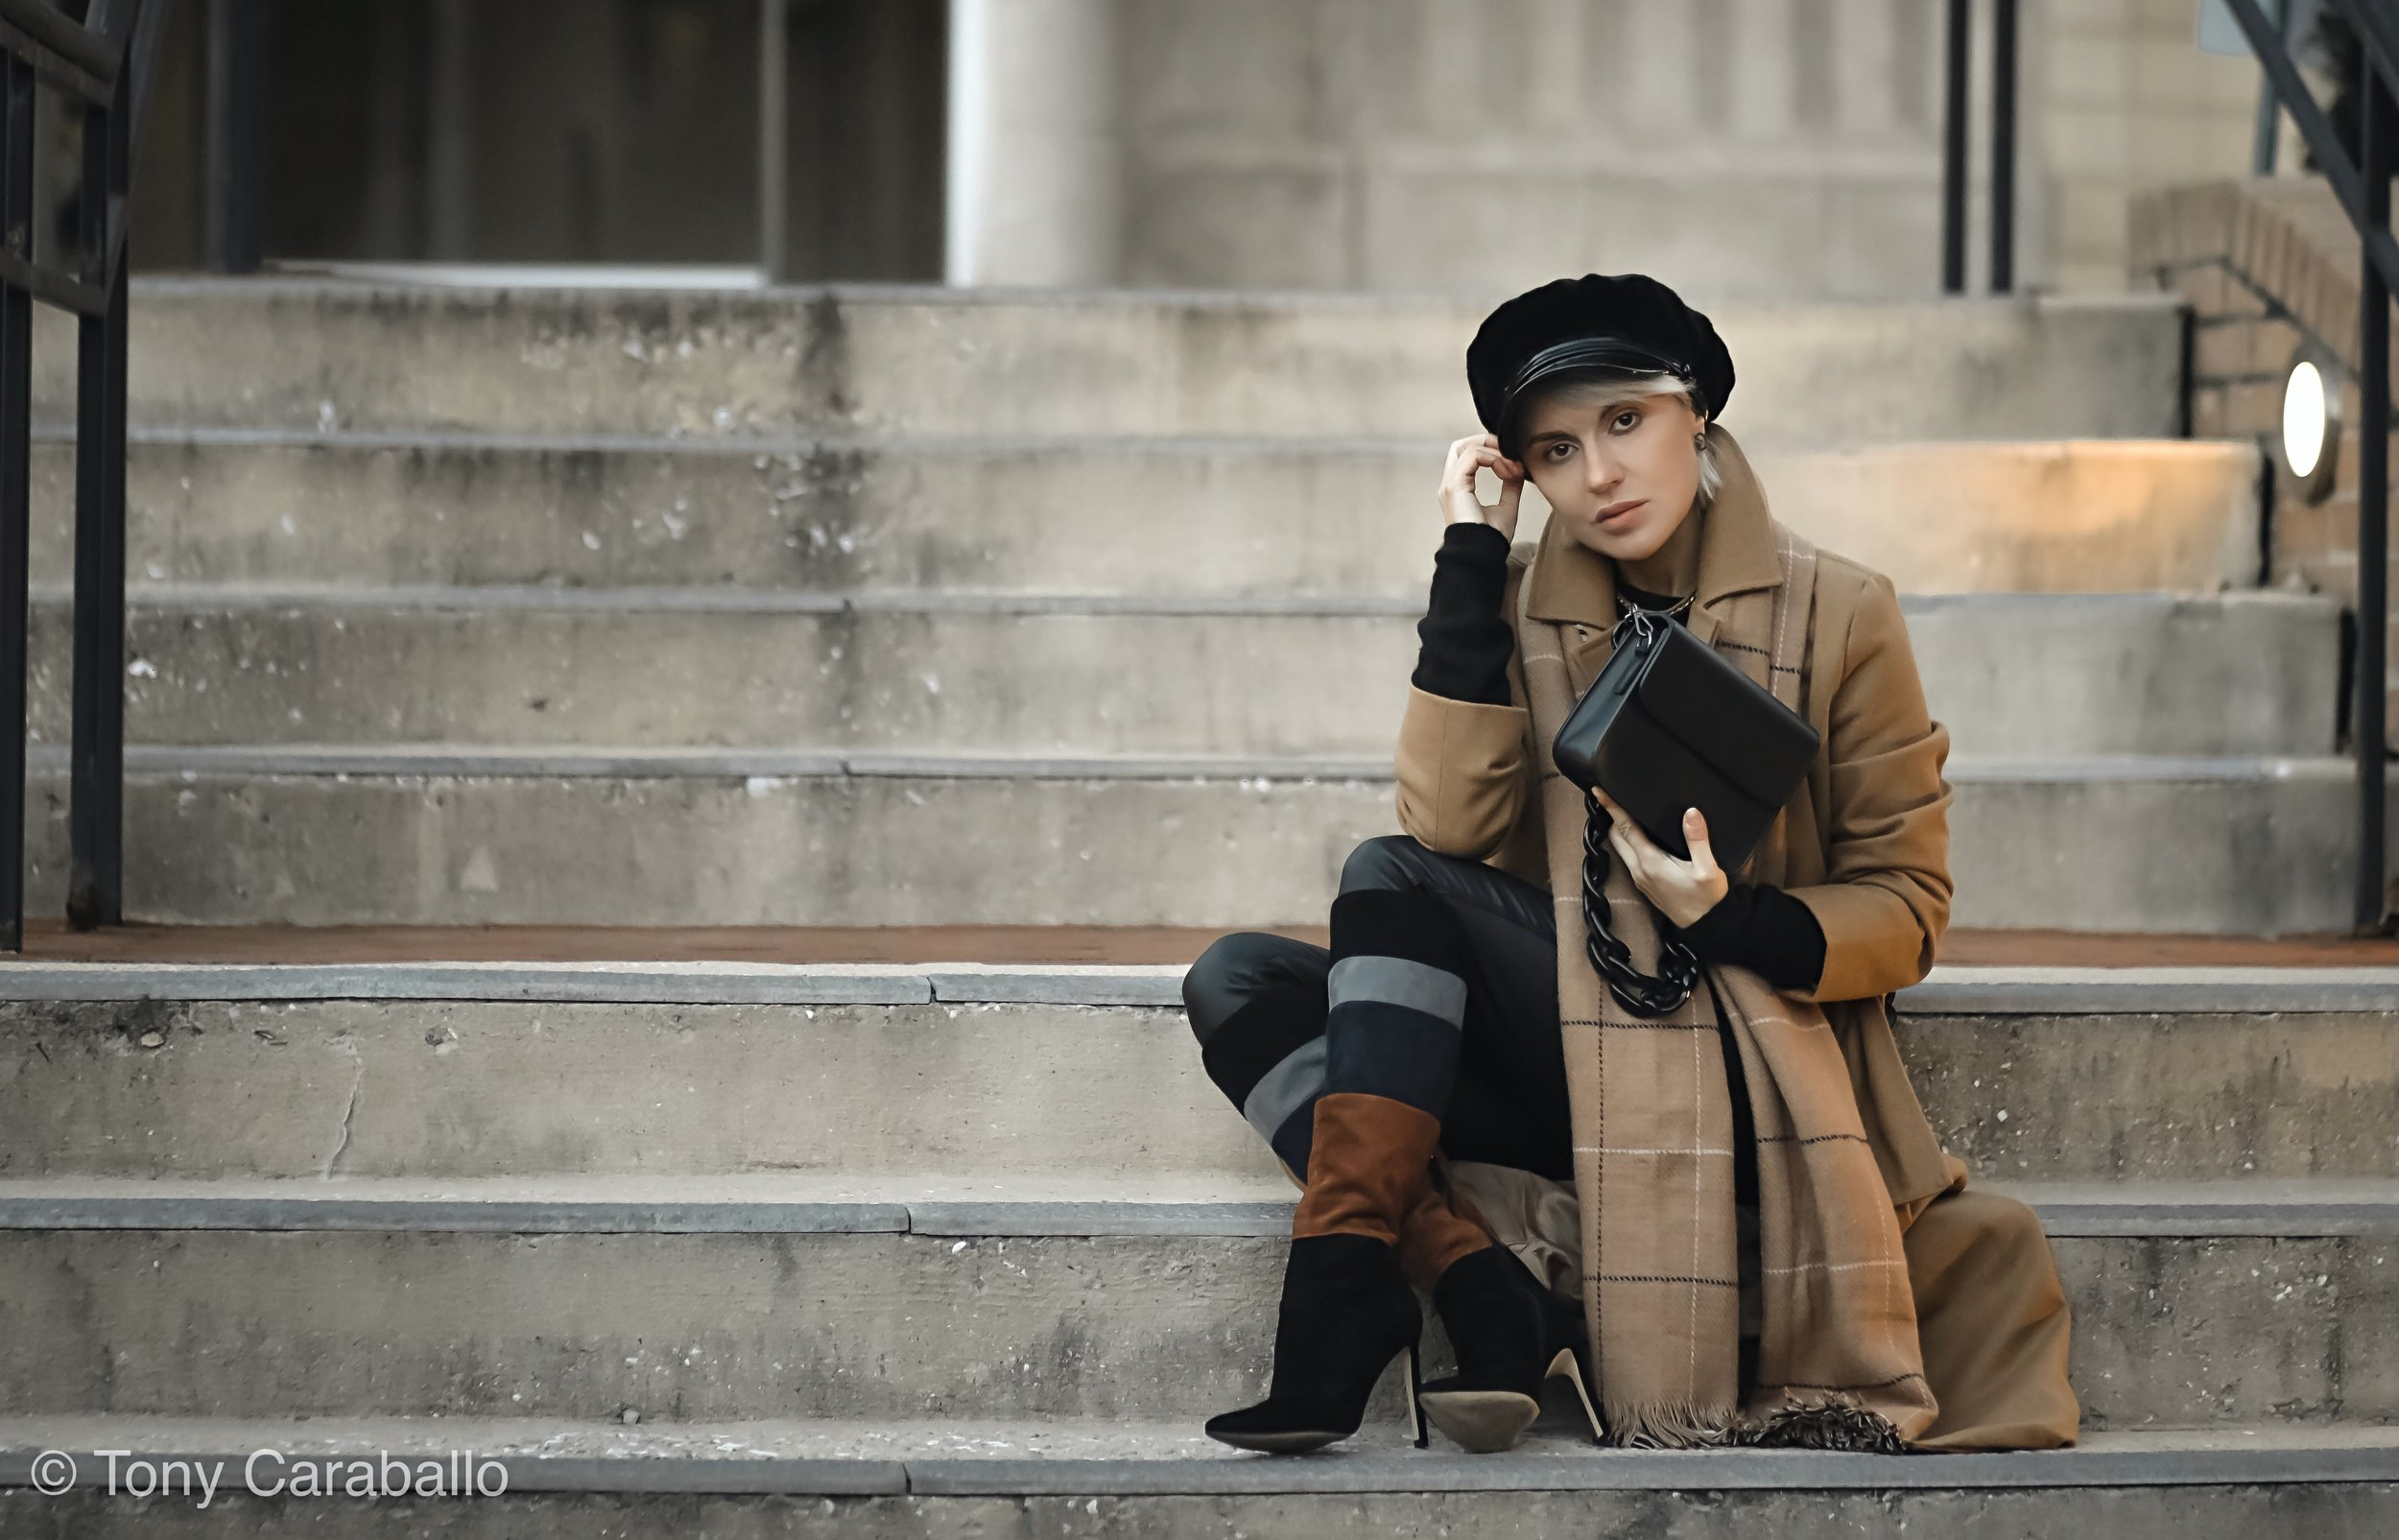 Isabel Chriselle Lim Tan coat sitting down